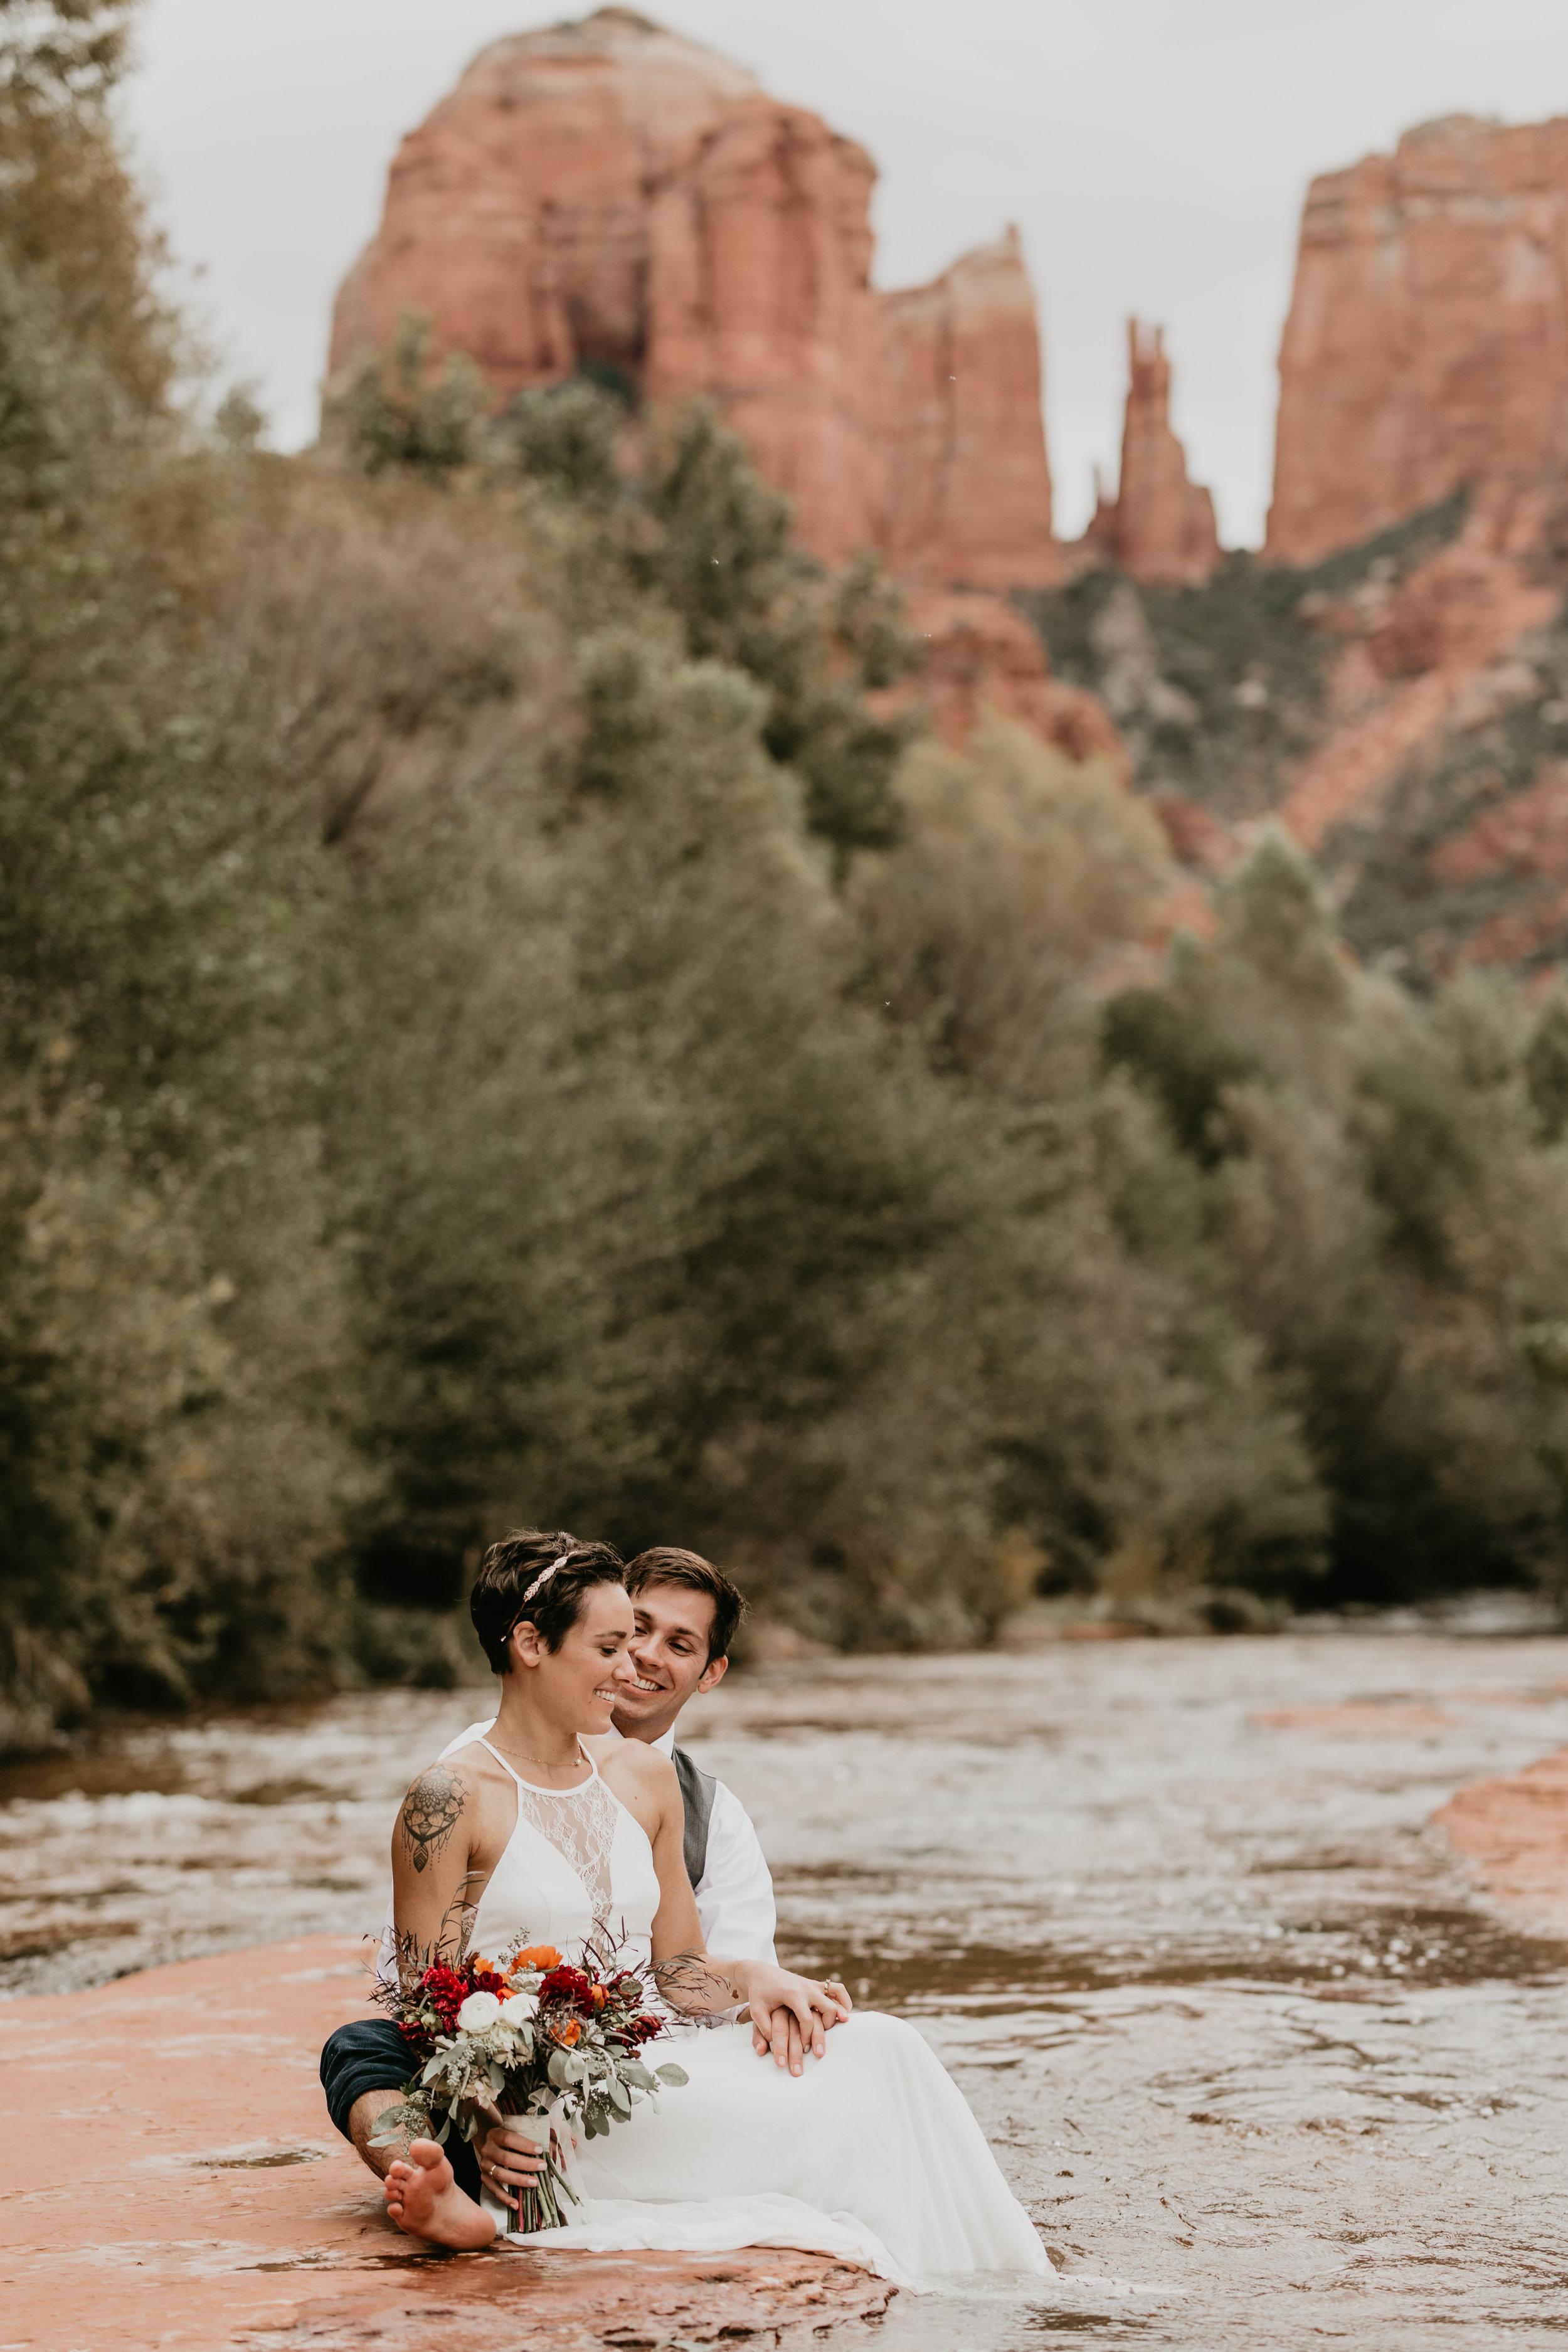 nicole-daacke-photography-sedona-arizona-destination-elopement-wedding-photographer-catherdral-rock-hiking-elopement-sedona-river-elopement-photos-desert-rock-wedding-photographer-laid-back-spontaneous-elopement-110.jpg